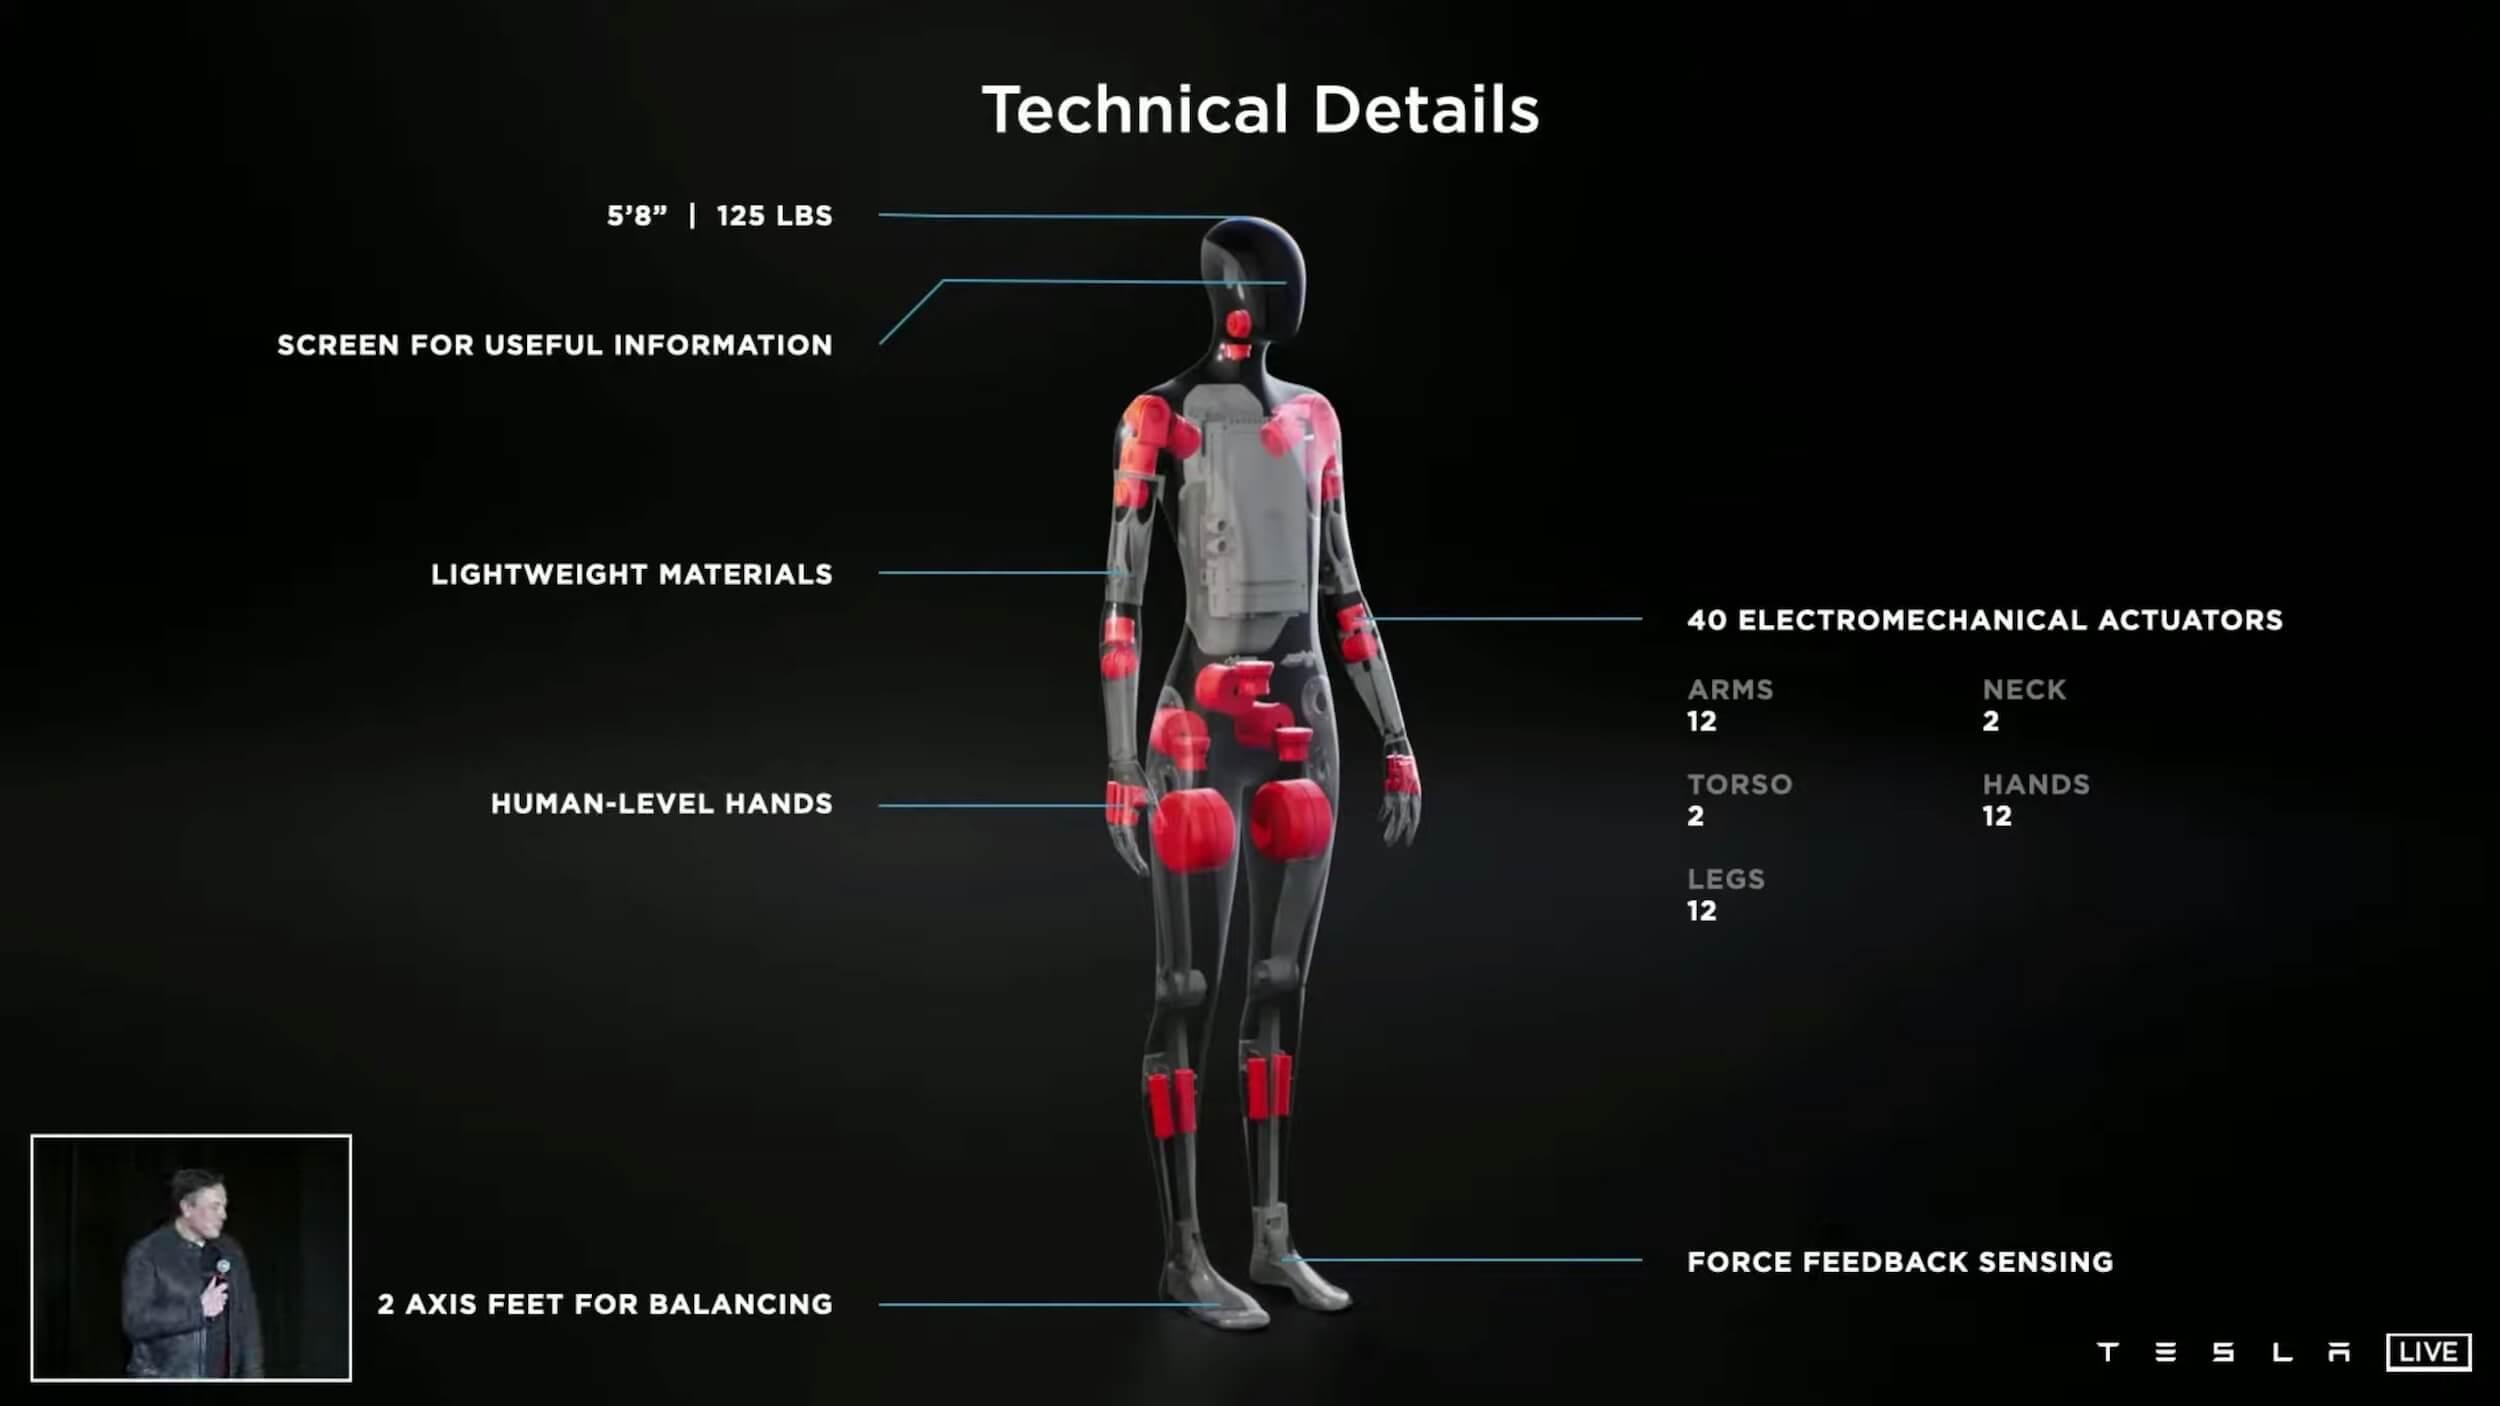 Tesla Robot Technical Details